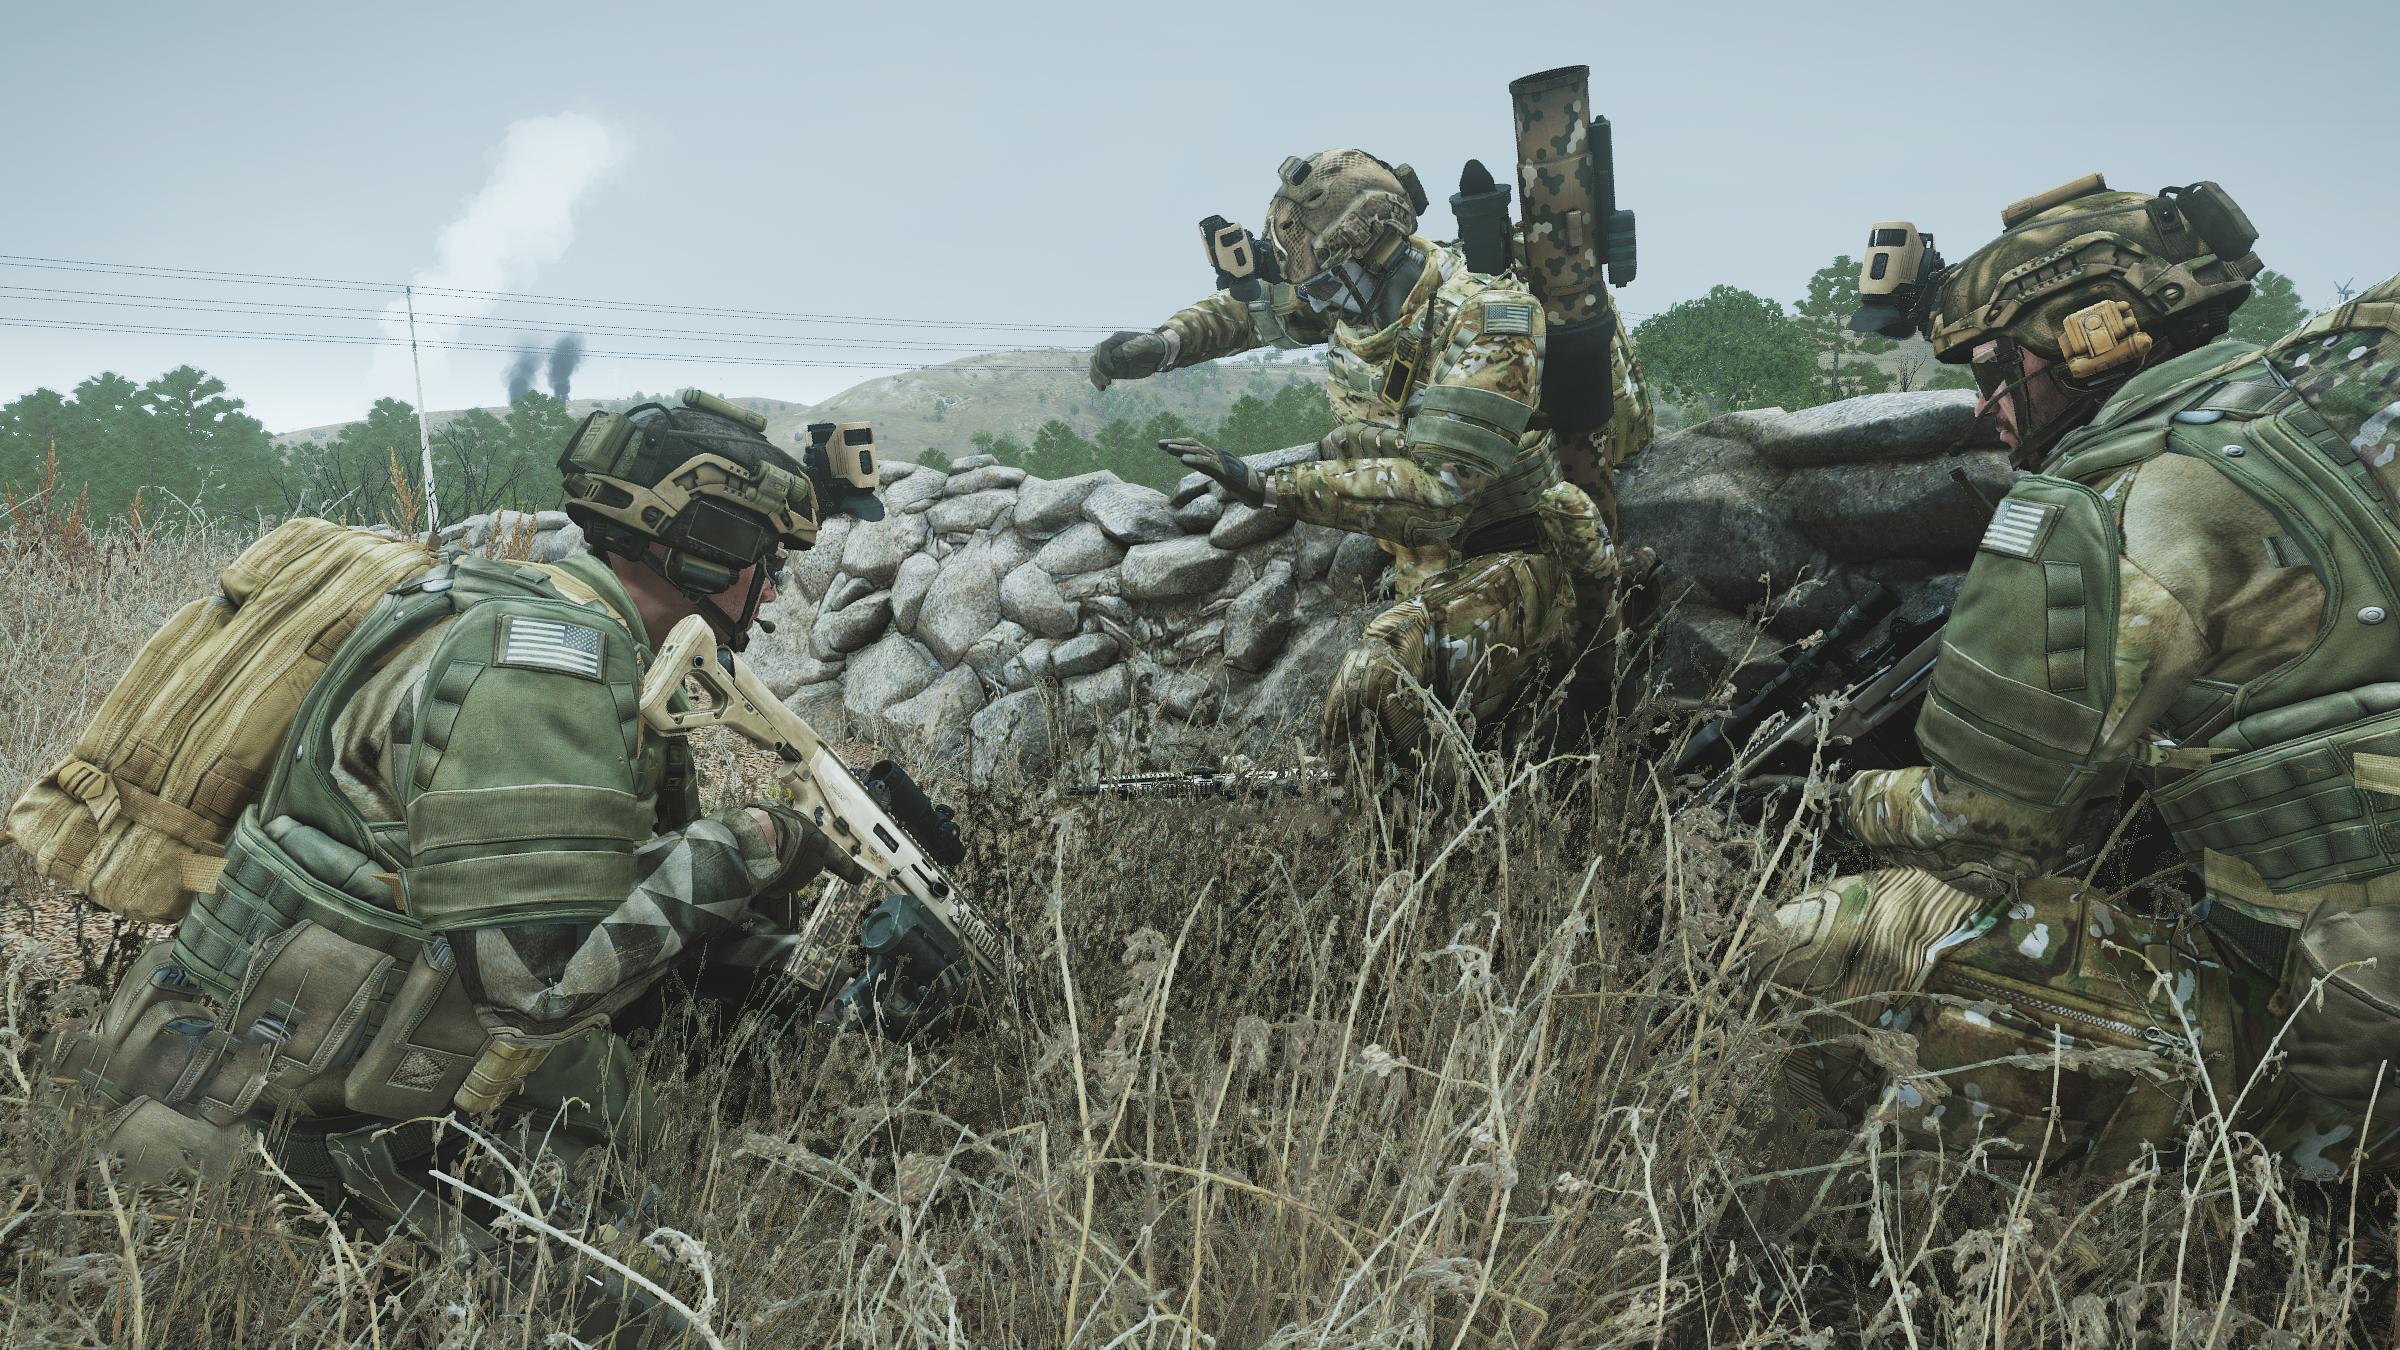 AhoyWorld | ArmA 3 Gaming community